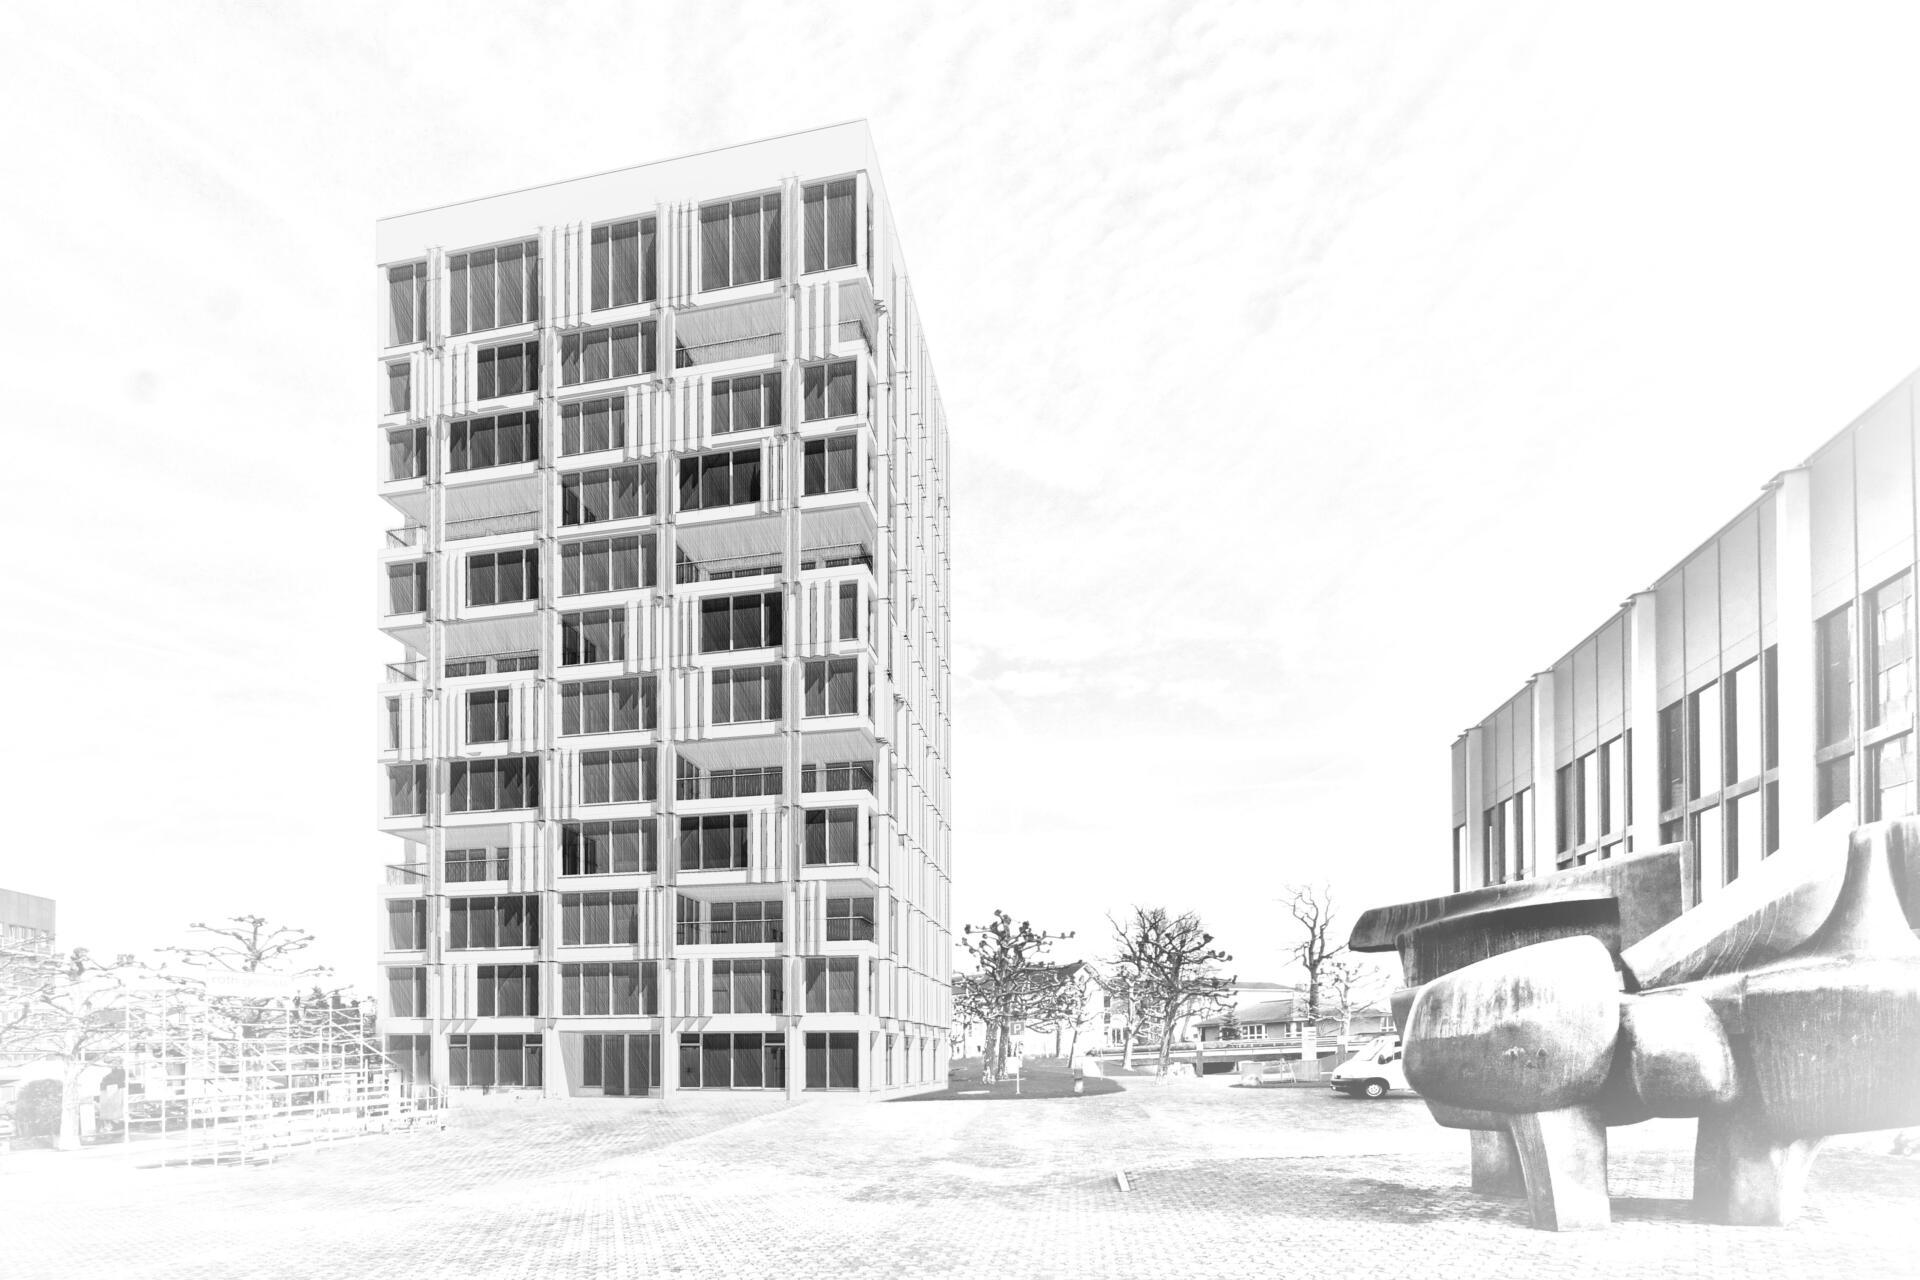 Projektarbeit Hochhaus